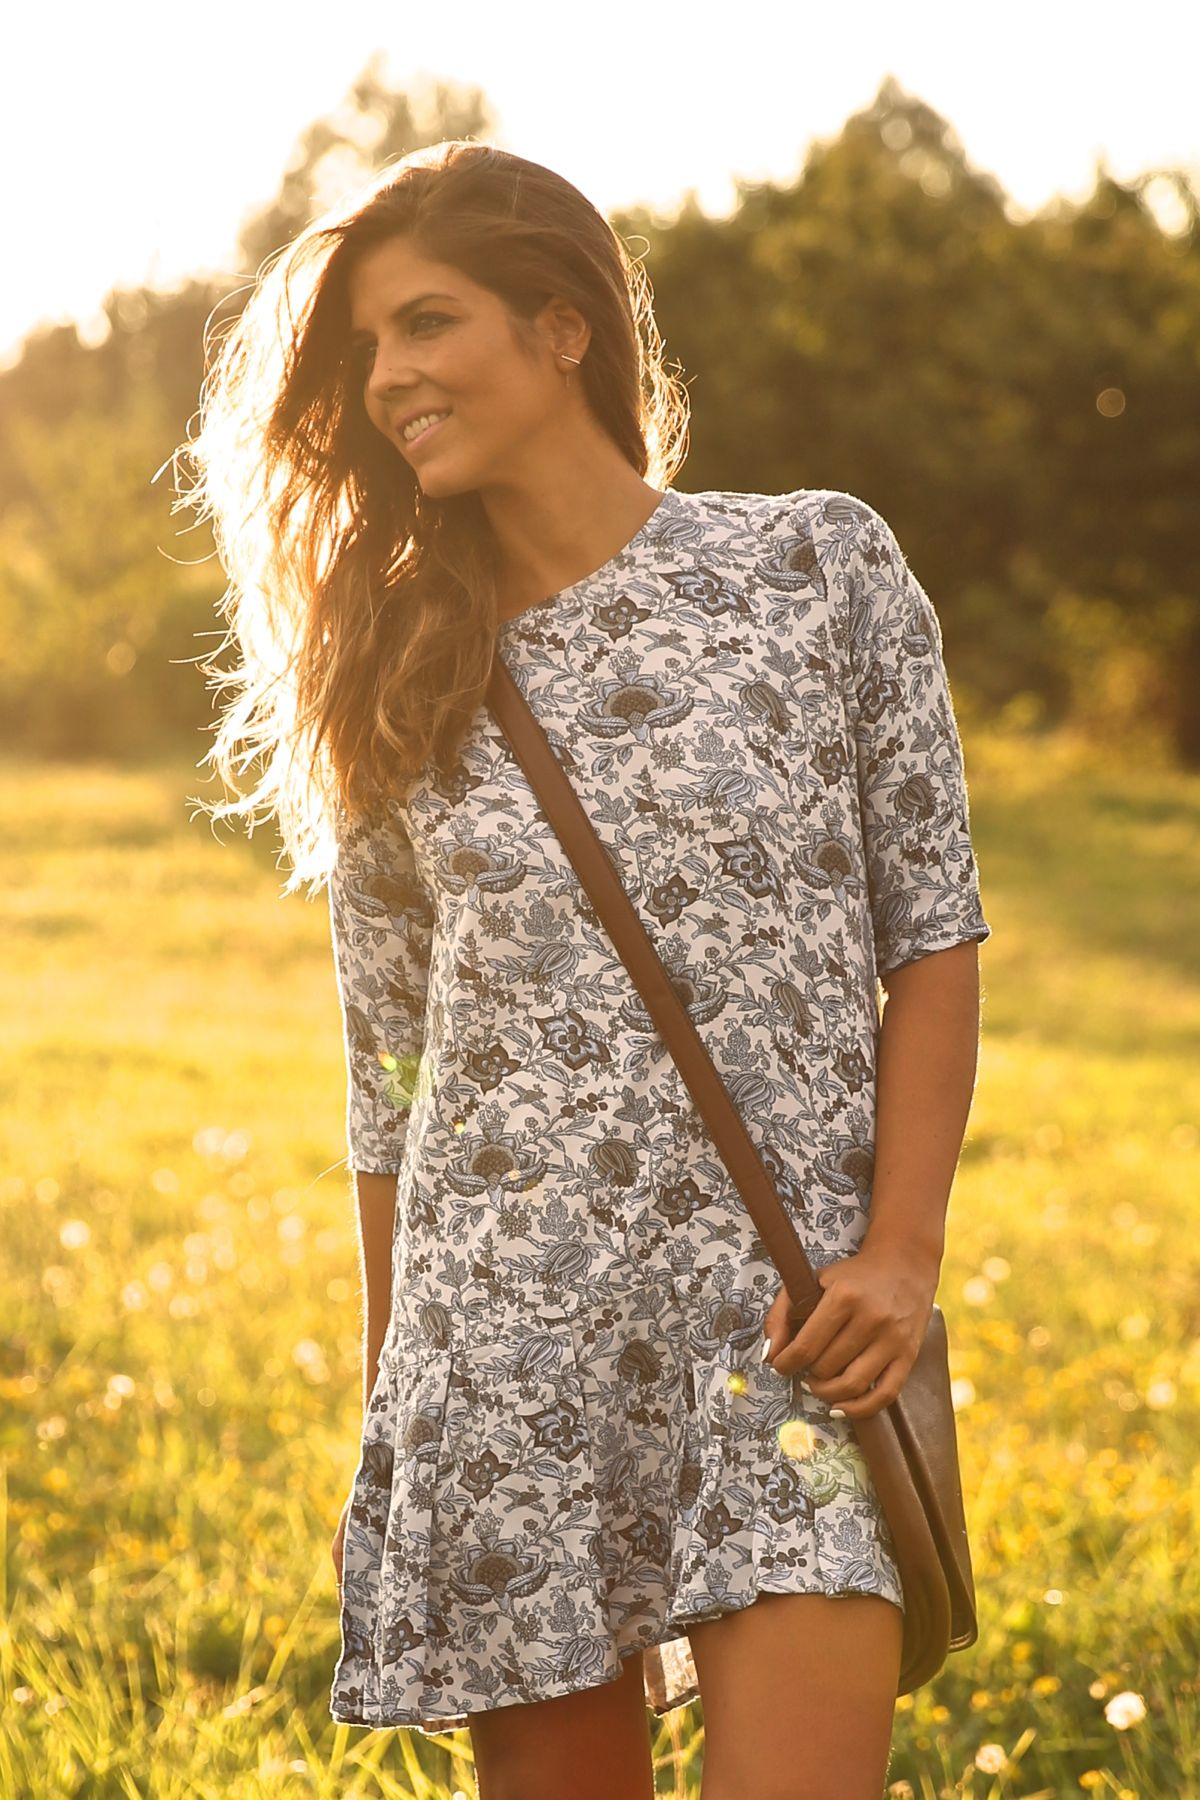 trendy_taste-look-outfit-street_style-ootd-blog-blogger-fashion_spain-moda_españa-cowboy-campero-sendra-cowboy_boots-botas_camperas-loewe-bag-bolso-vestido_flores-flower_print-dress-6